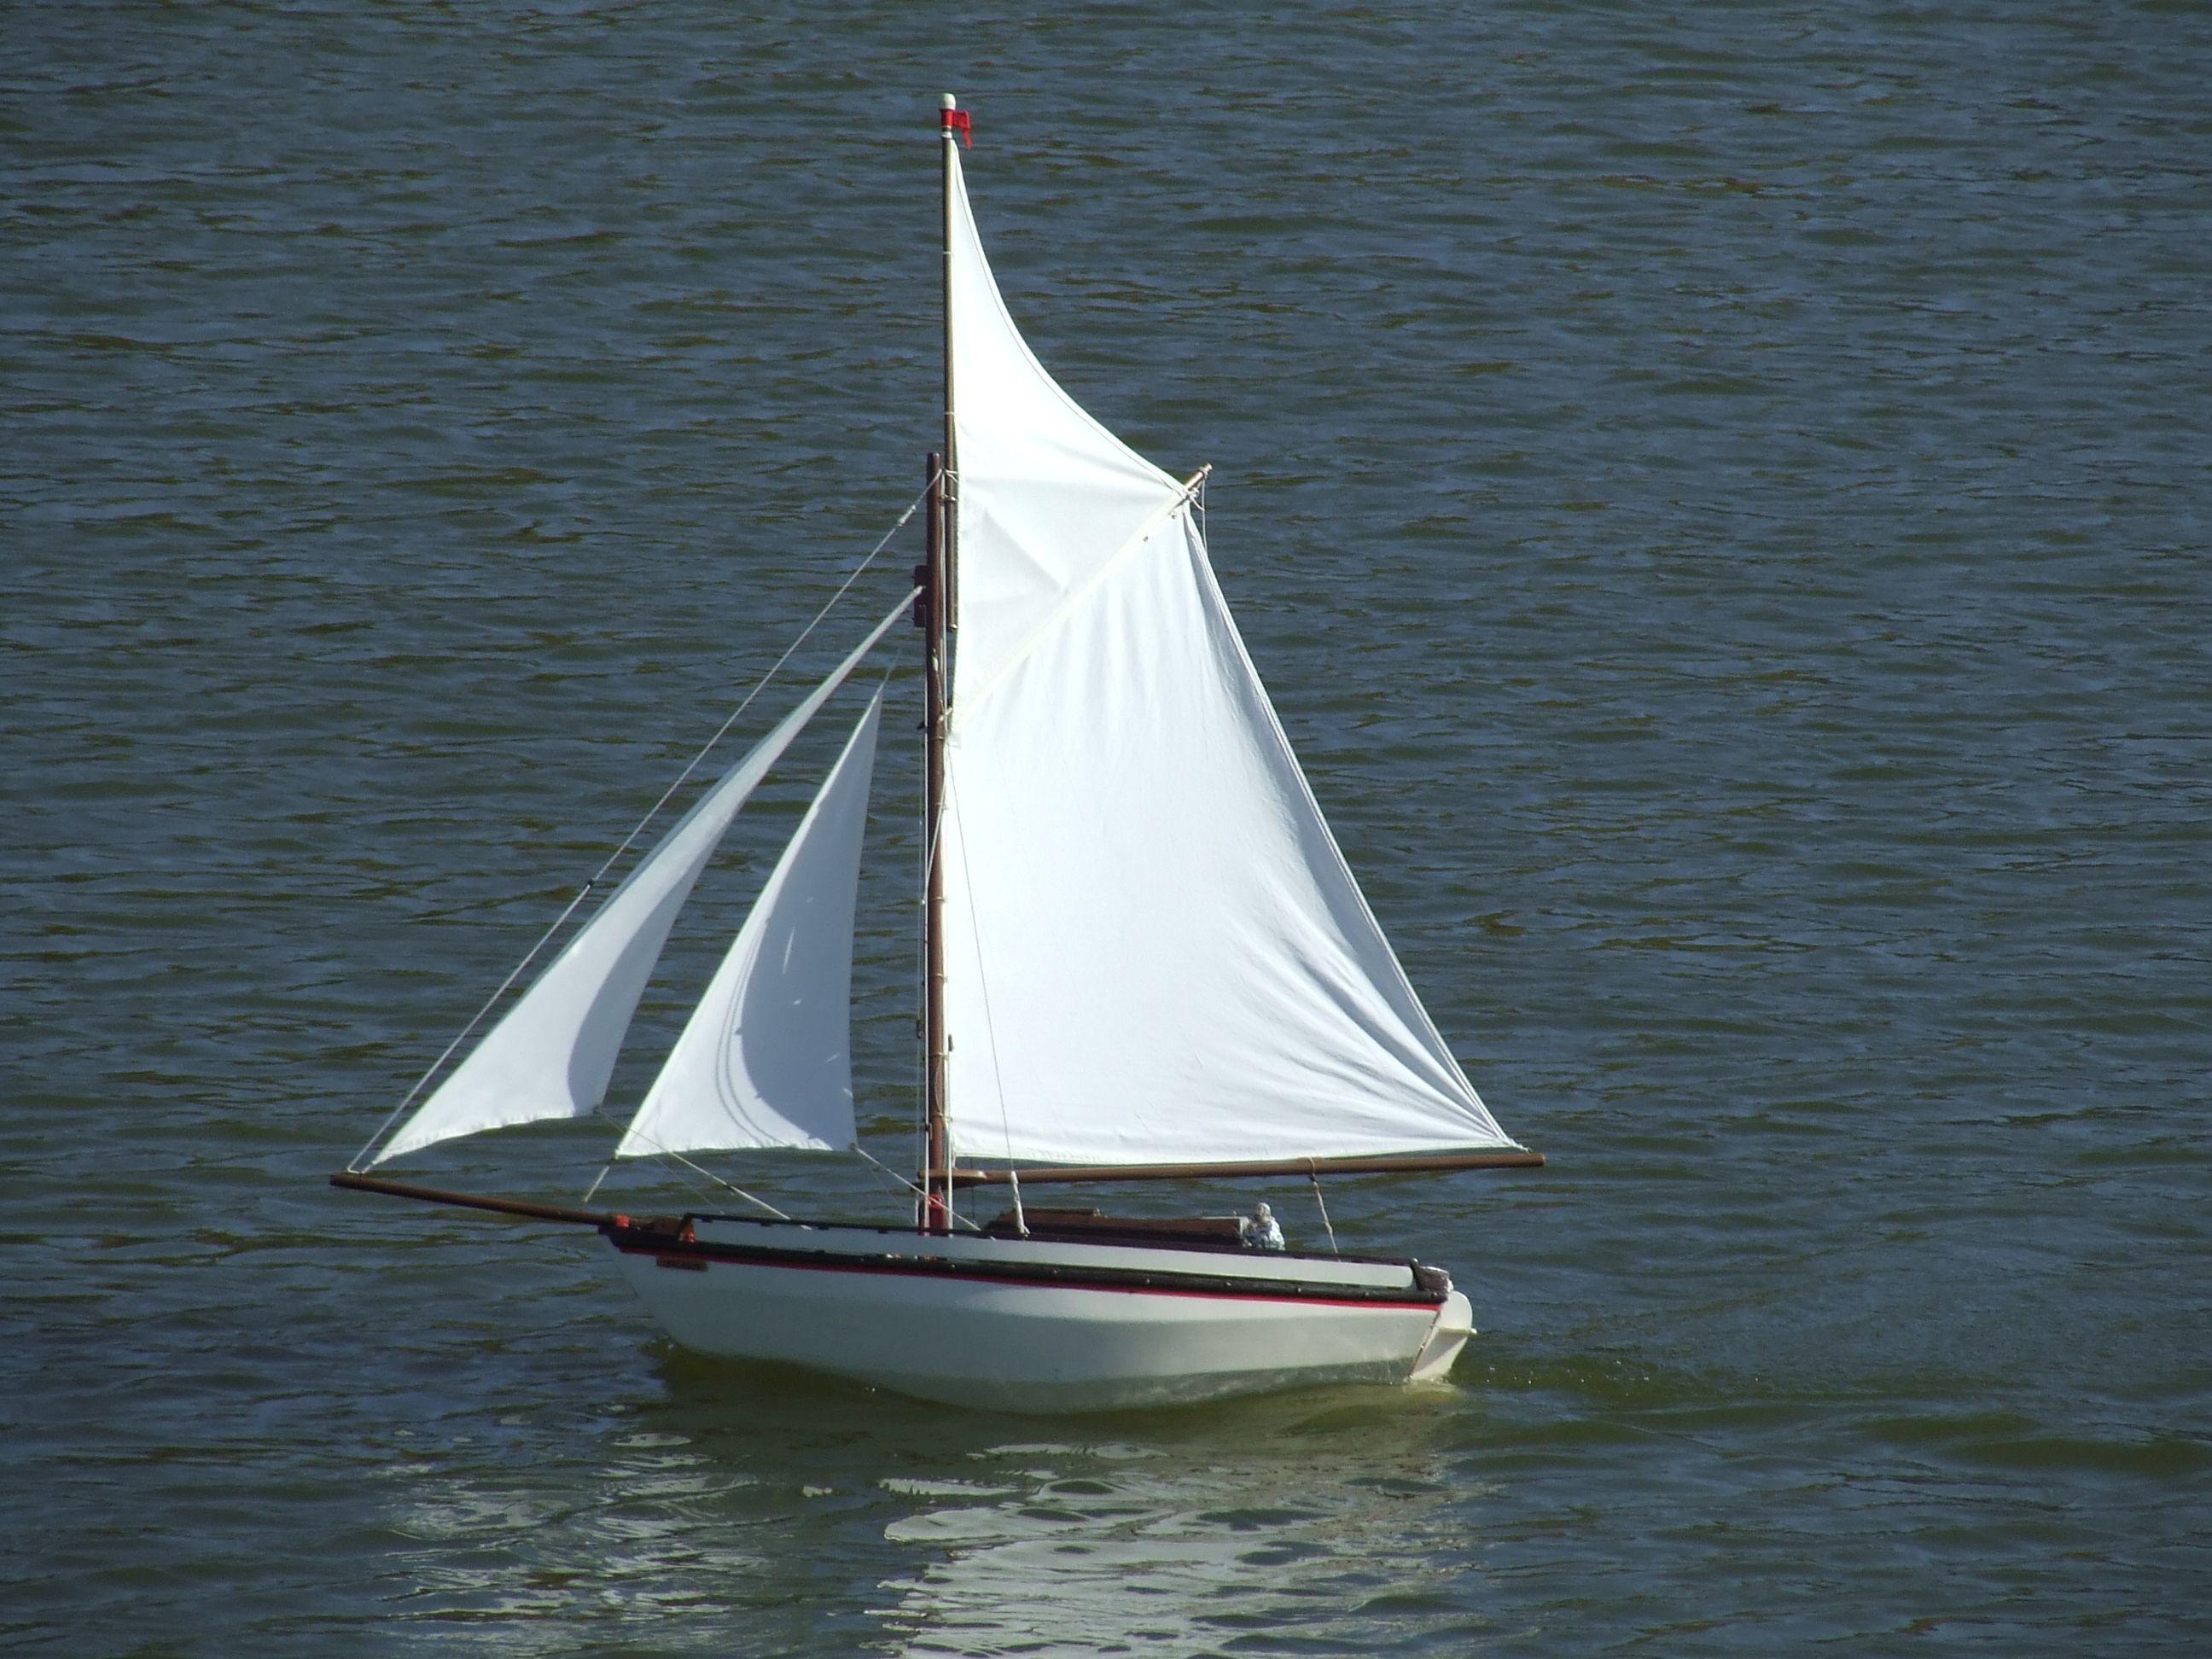 Sailing boat near the coast | Boats <3 | Pinterest | Sailing boat ...